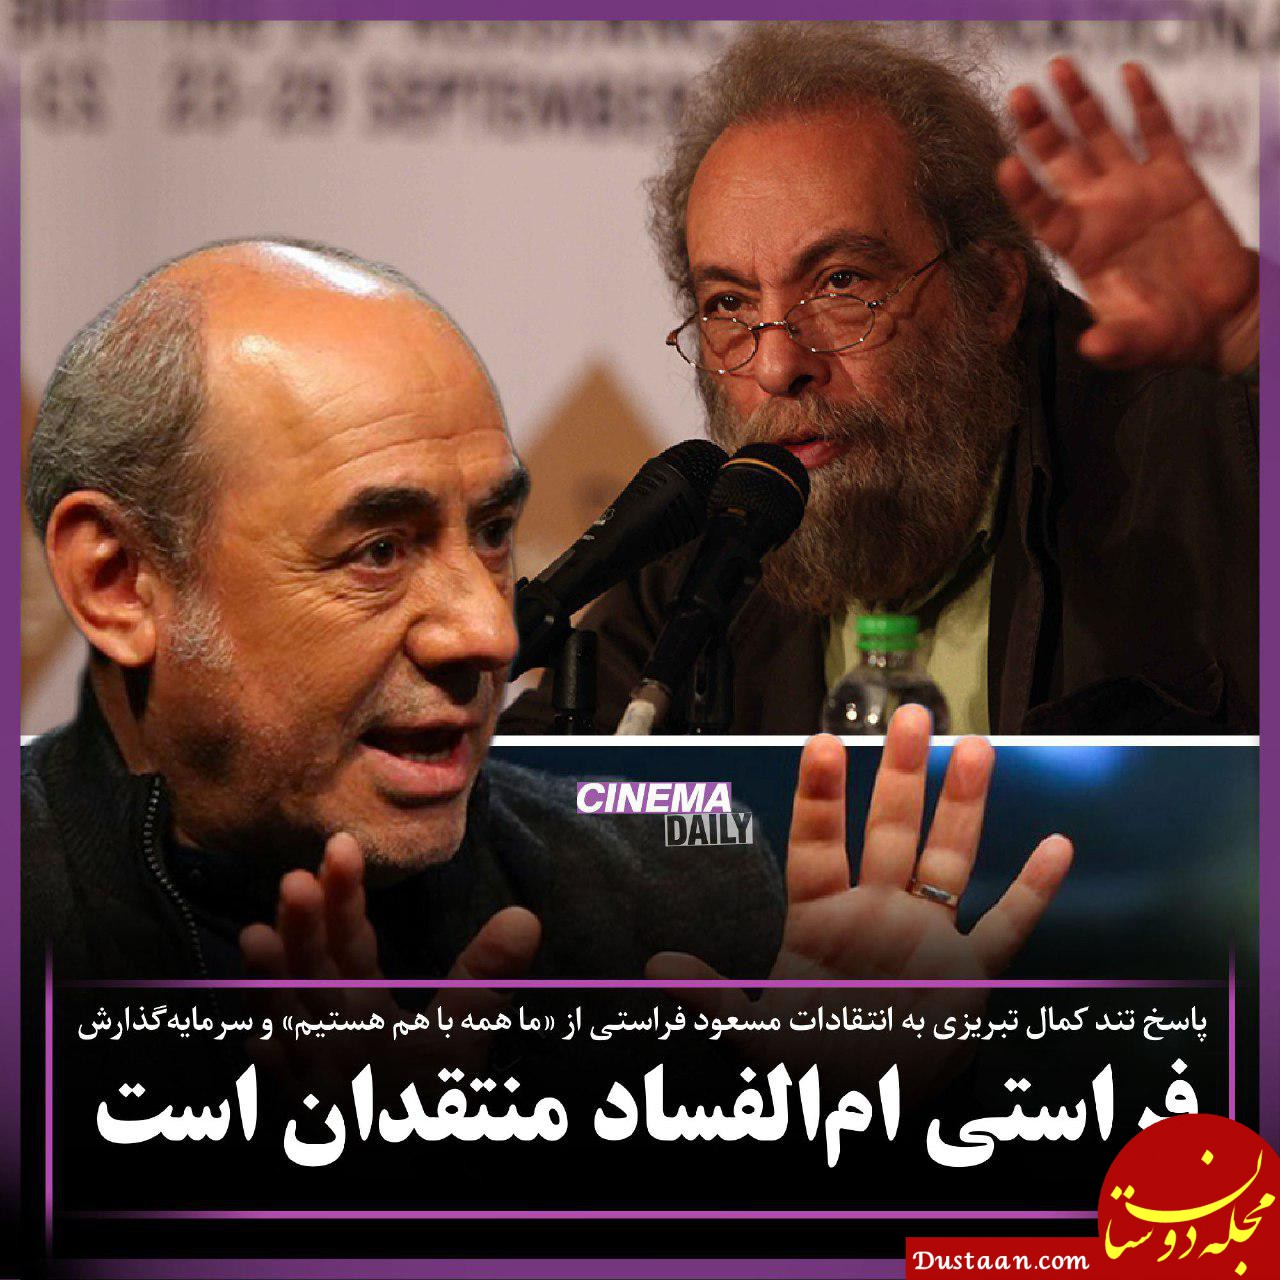 www.dustaan.com کمال تبریزی: فراستی ام الفساد منتقدان است!